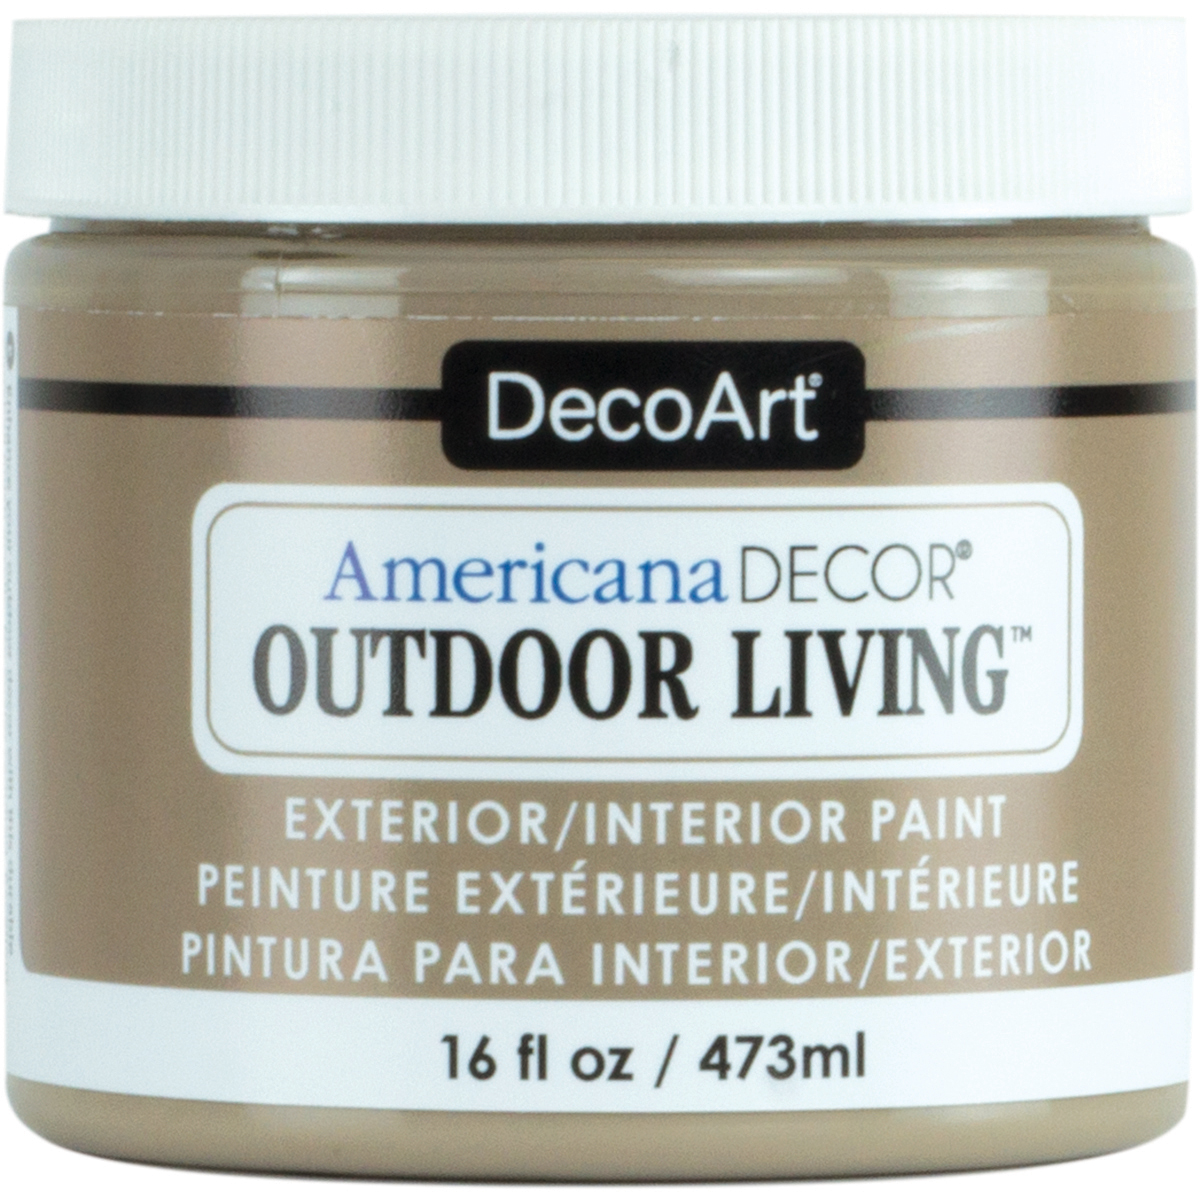 Pergola - Americana Decor Outdoor Living Paint 16oz